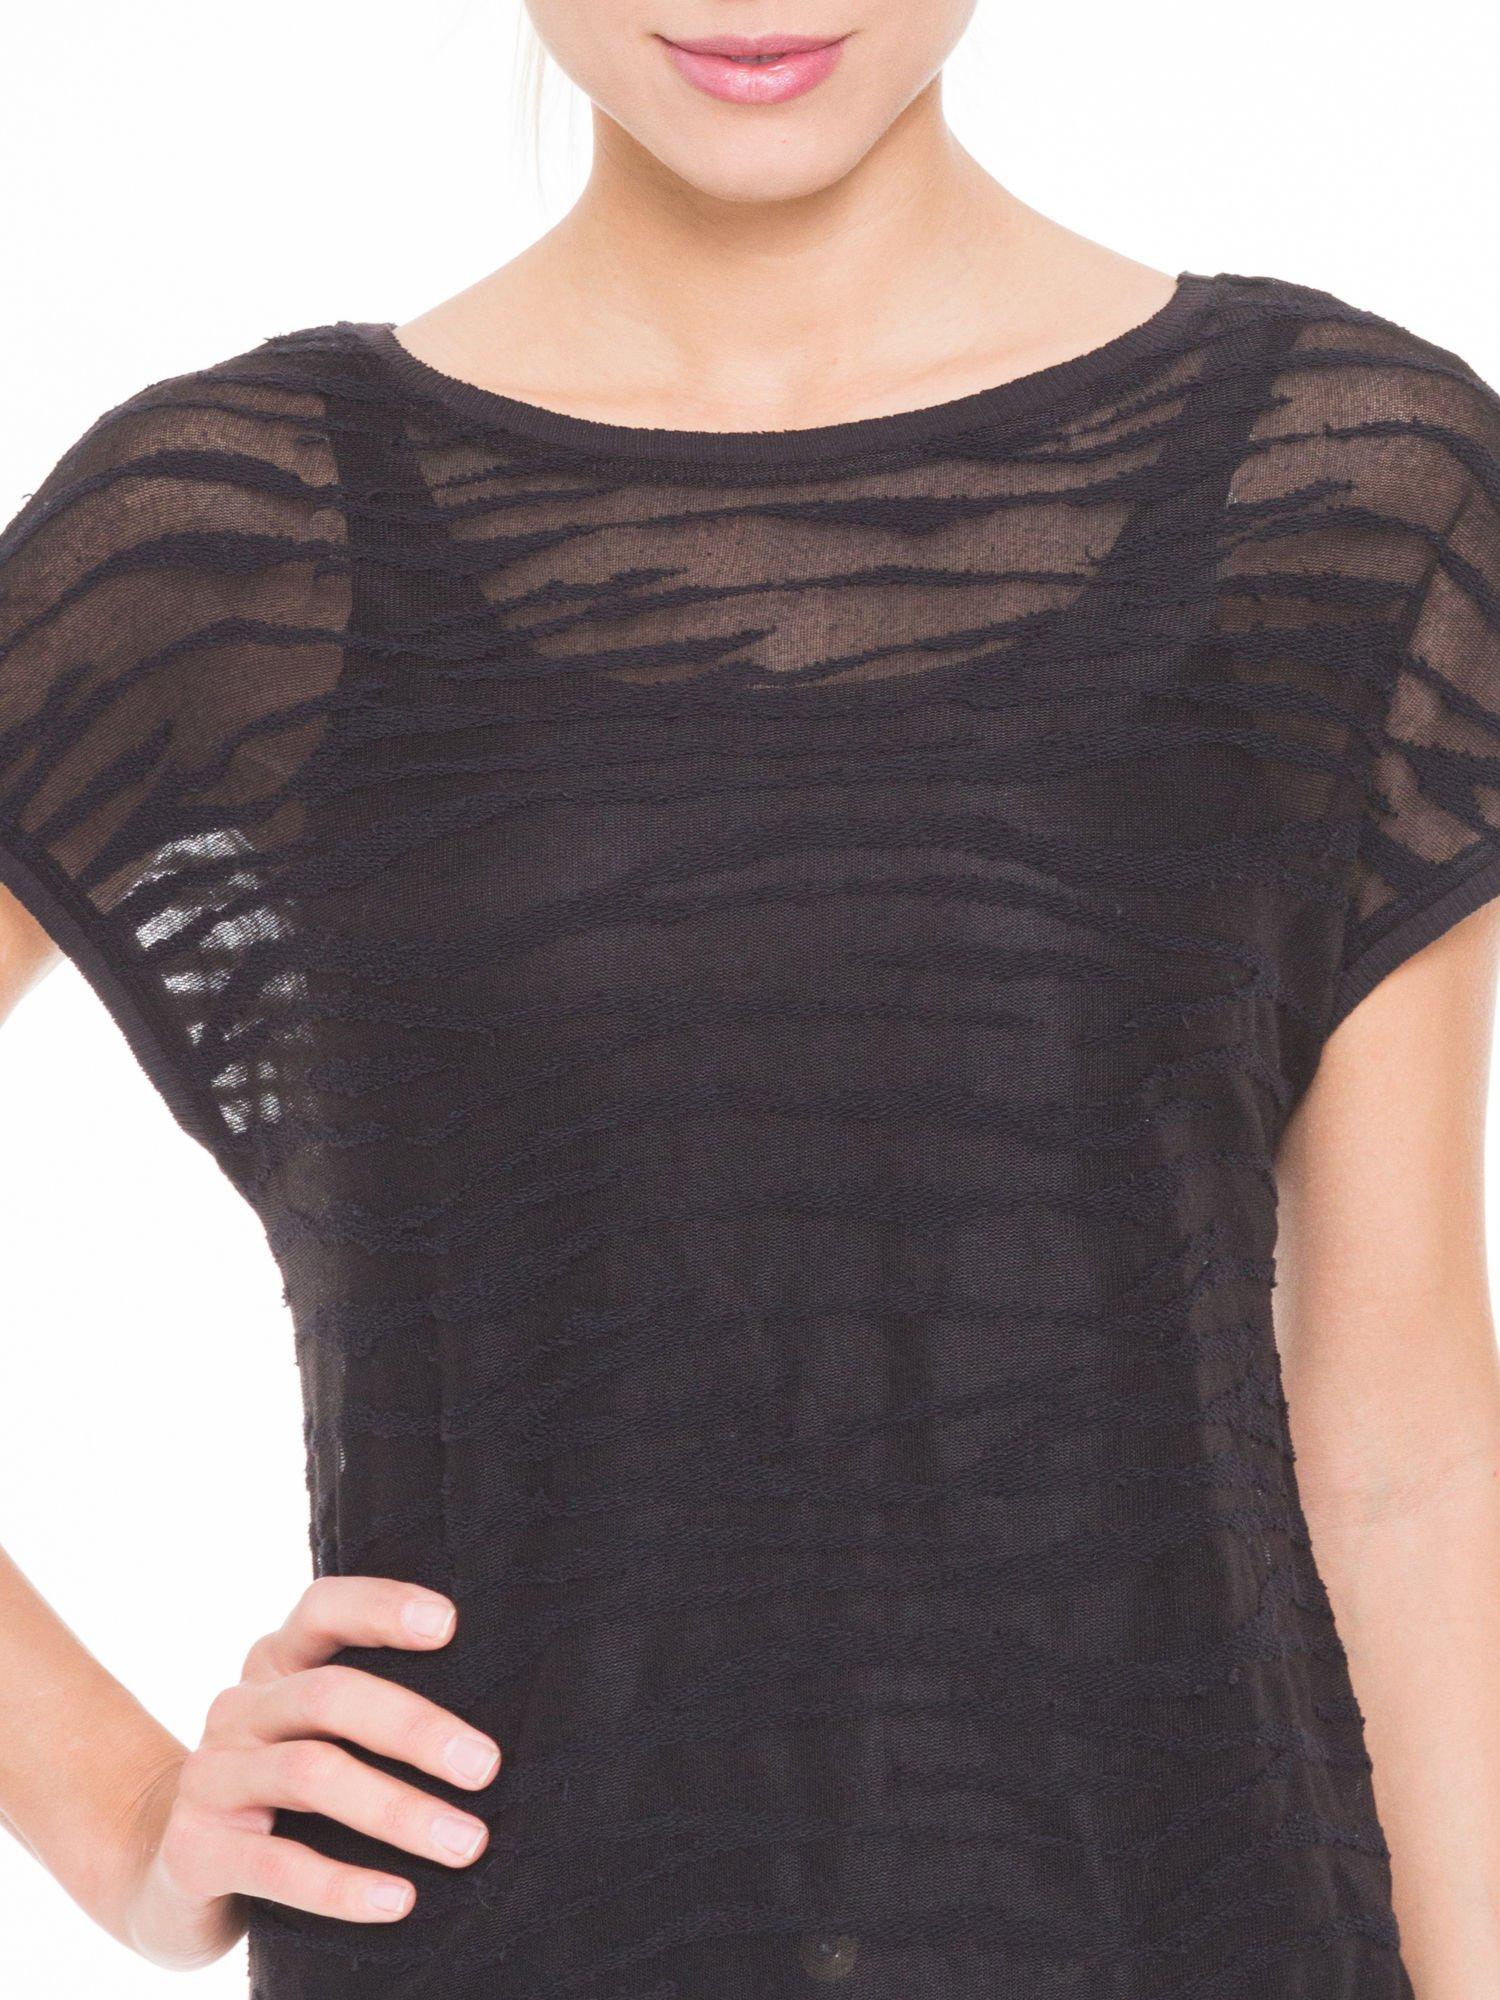 Czarny t-shirt mgiełka we wzór animal print                                  zdj.                                  5